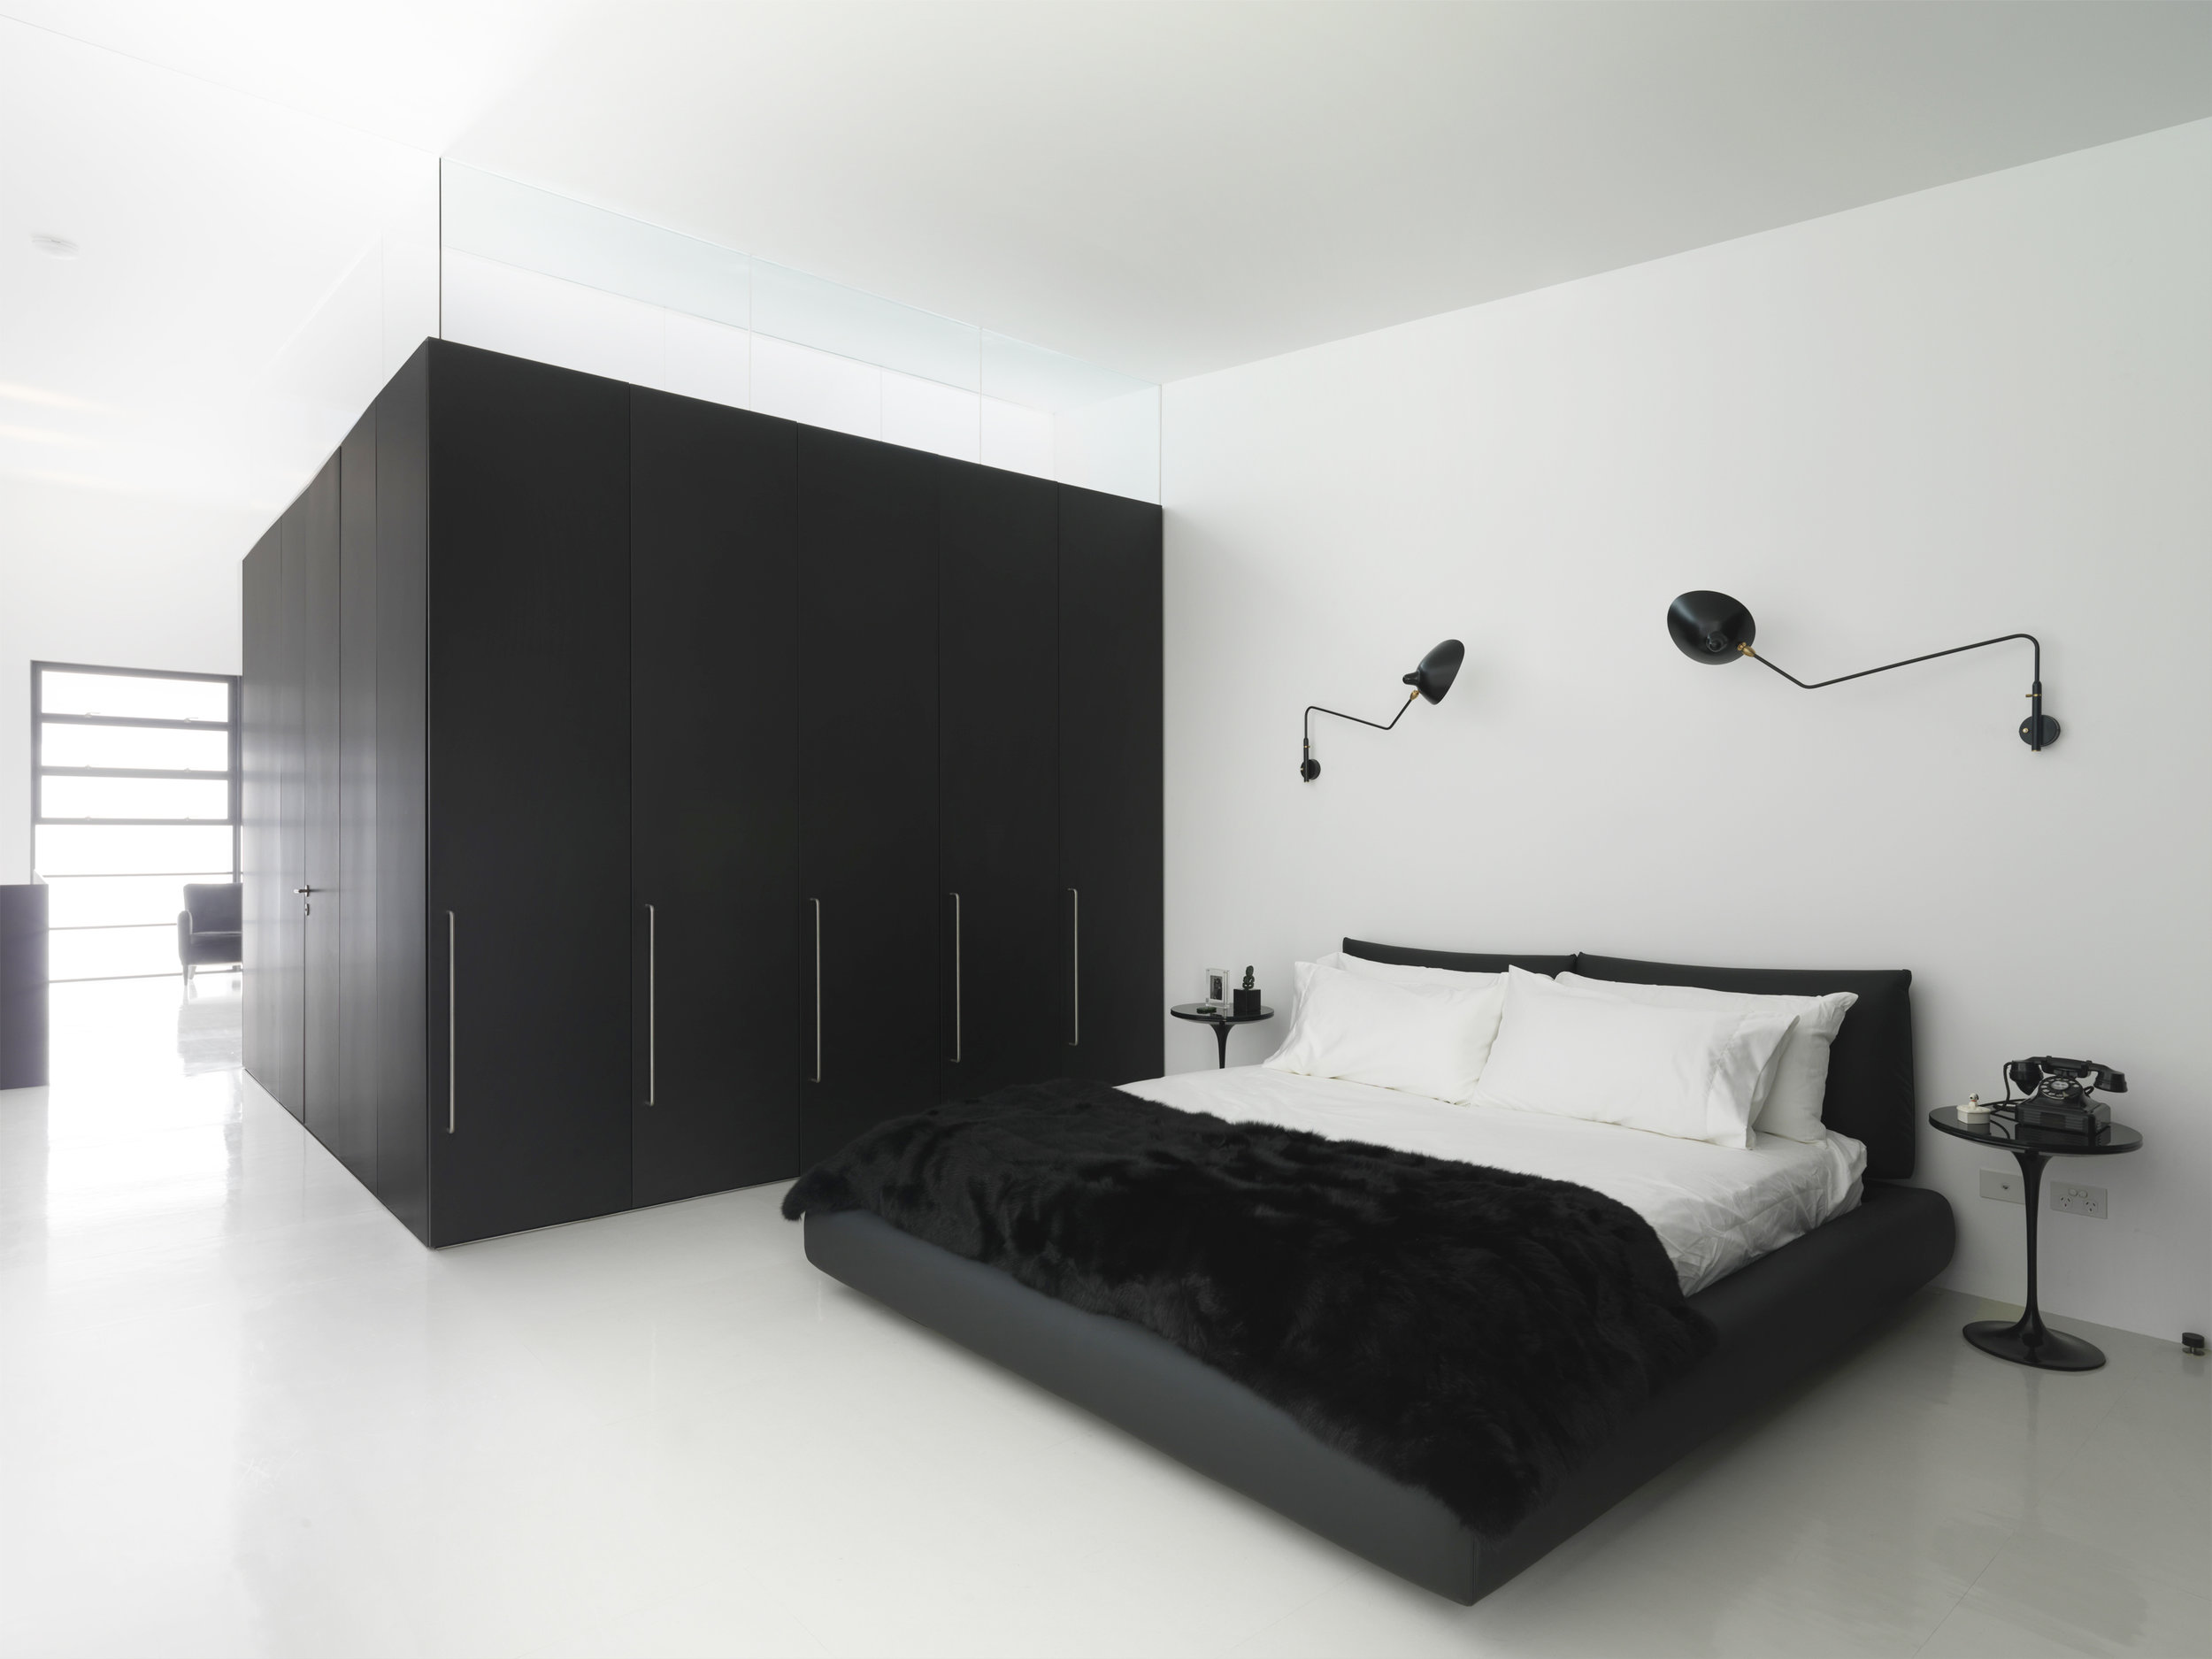 x08 0830-Strelein WH-MR-034-bedroom.jpg